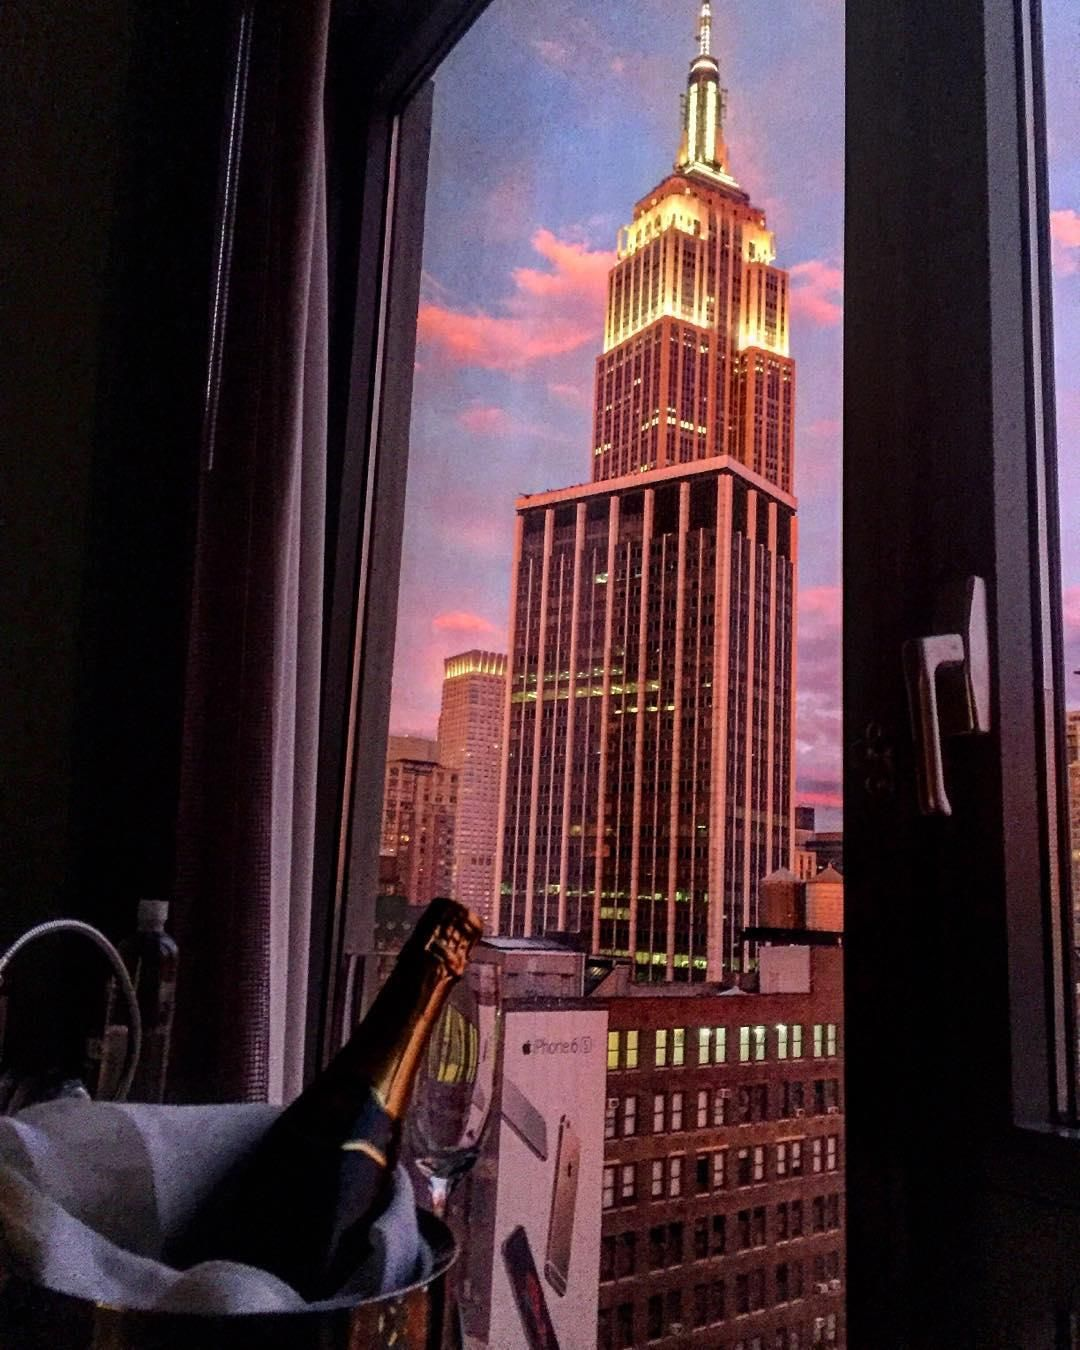 Best New York City Hotels: Eventi Hotel